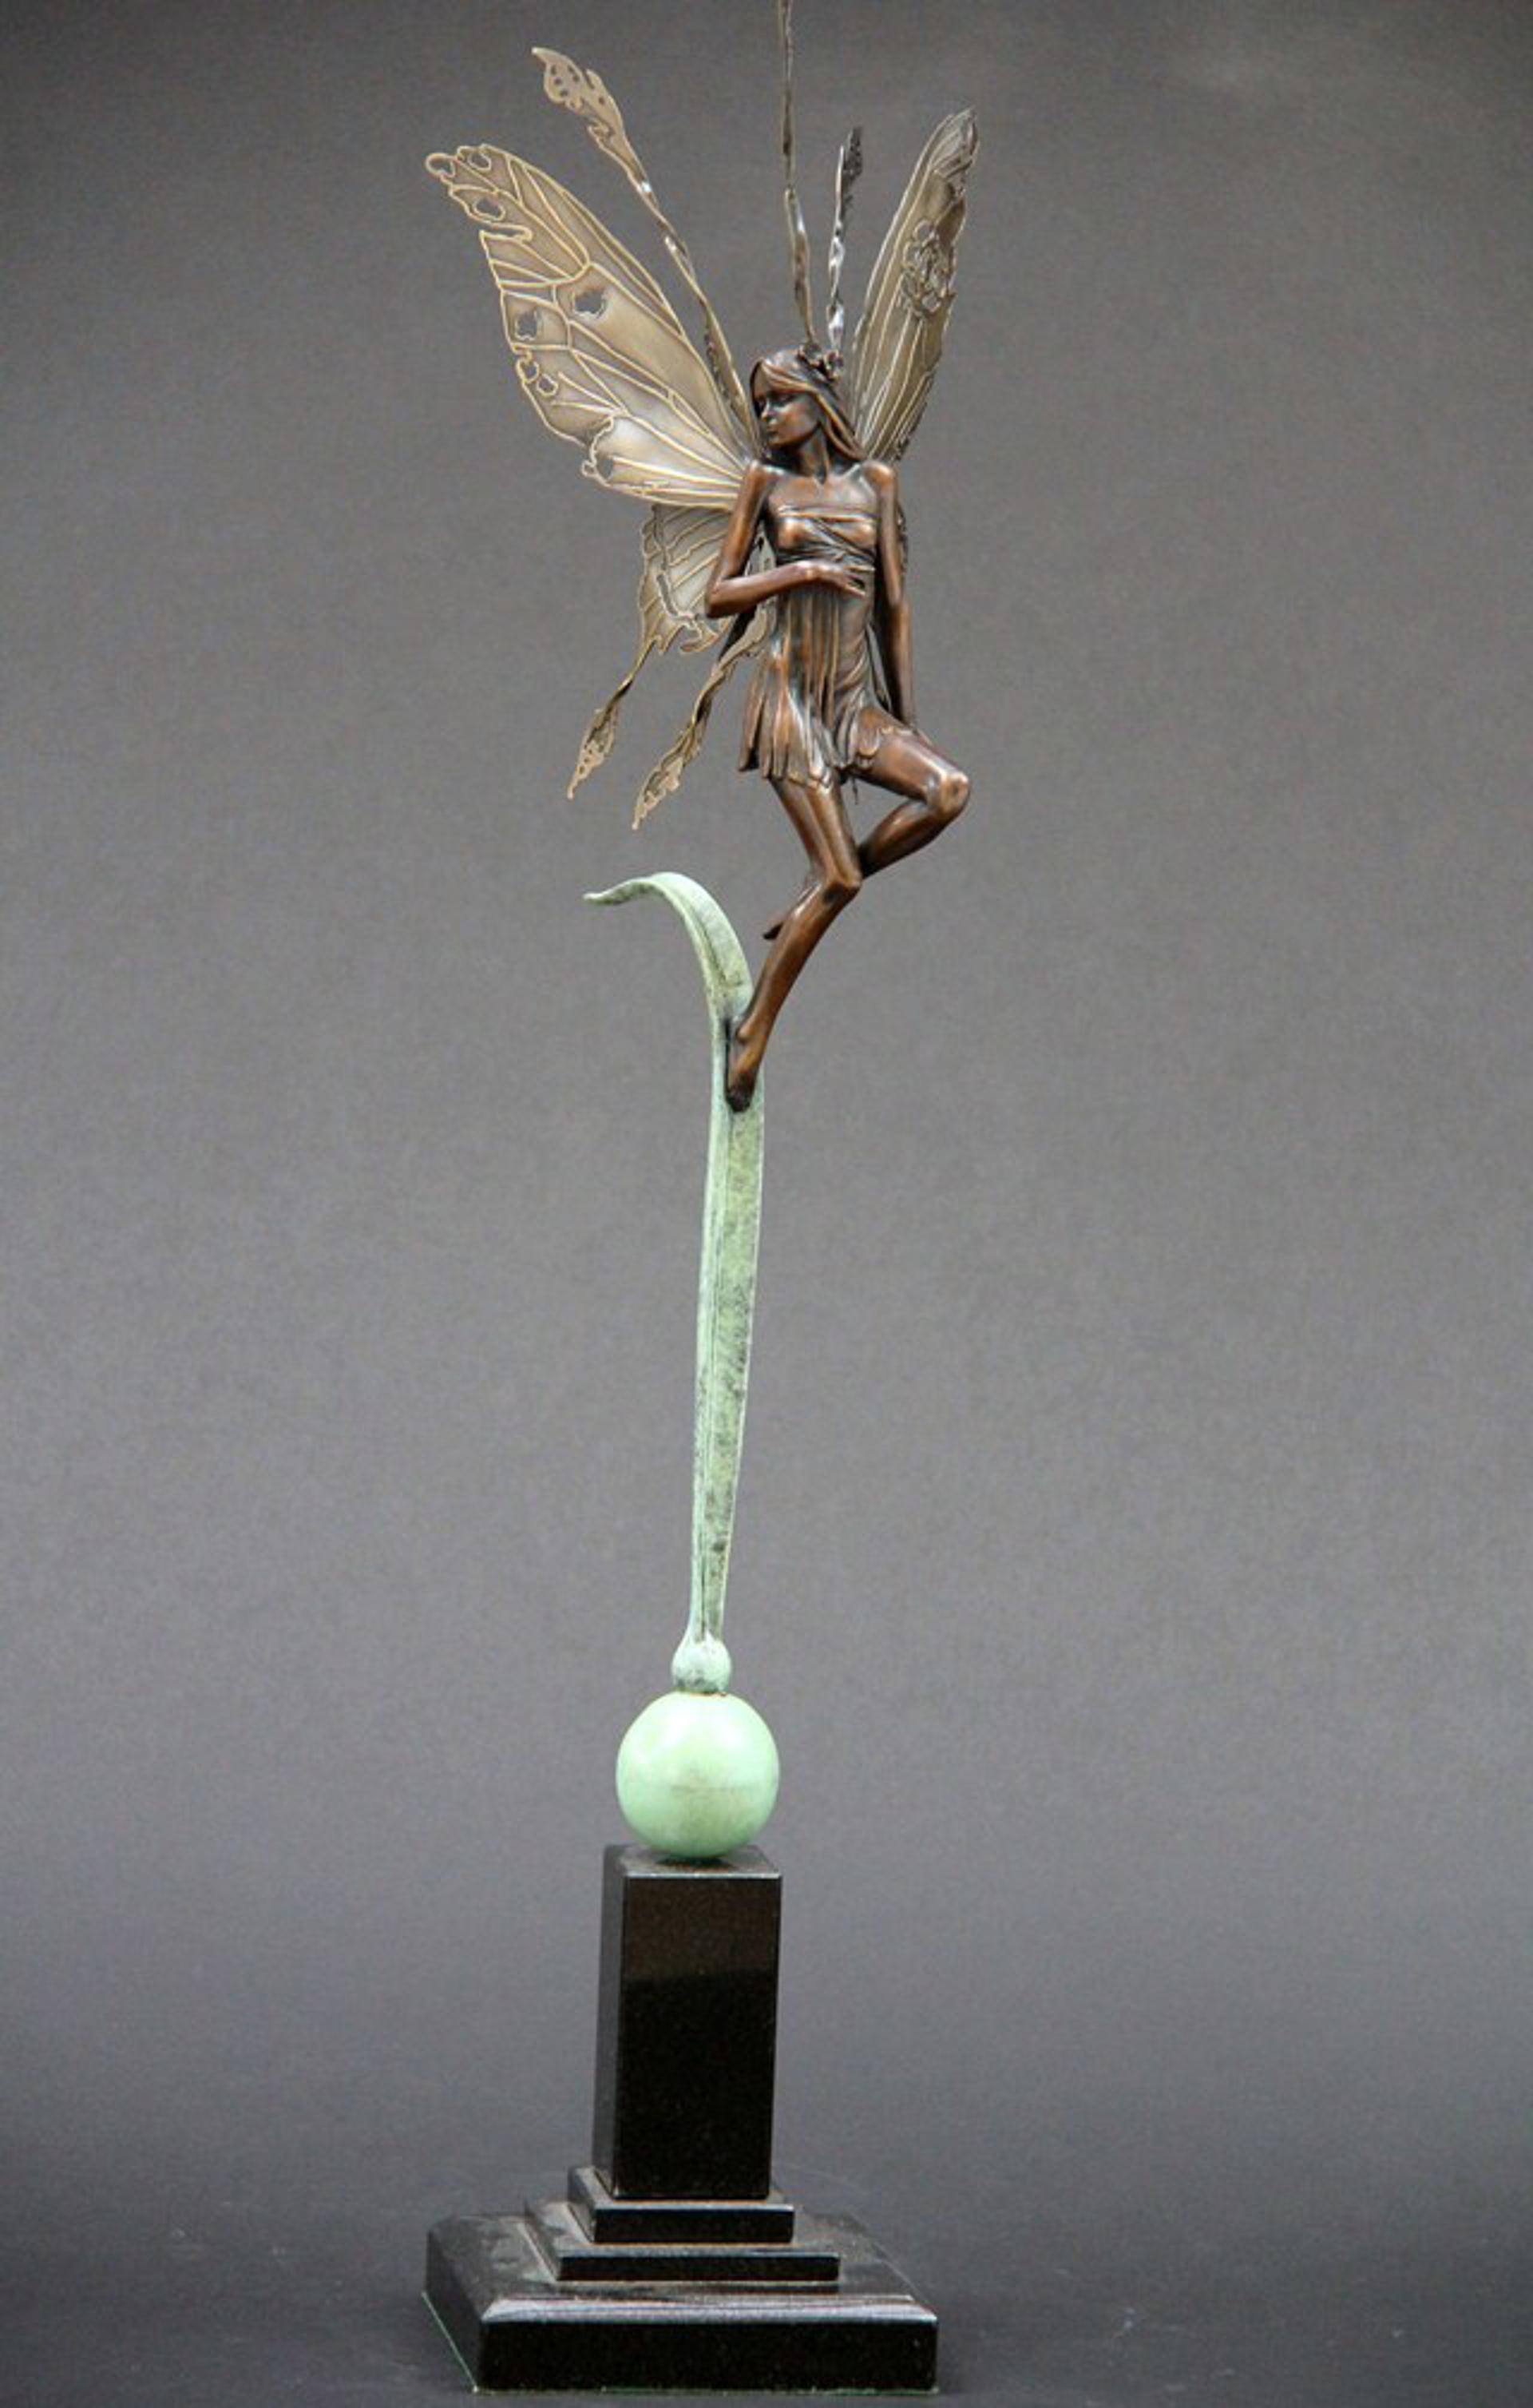 Fairies - Daylight Dreams Alight by Michael Talbot